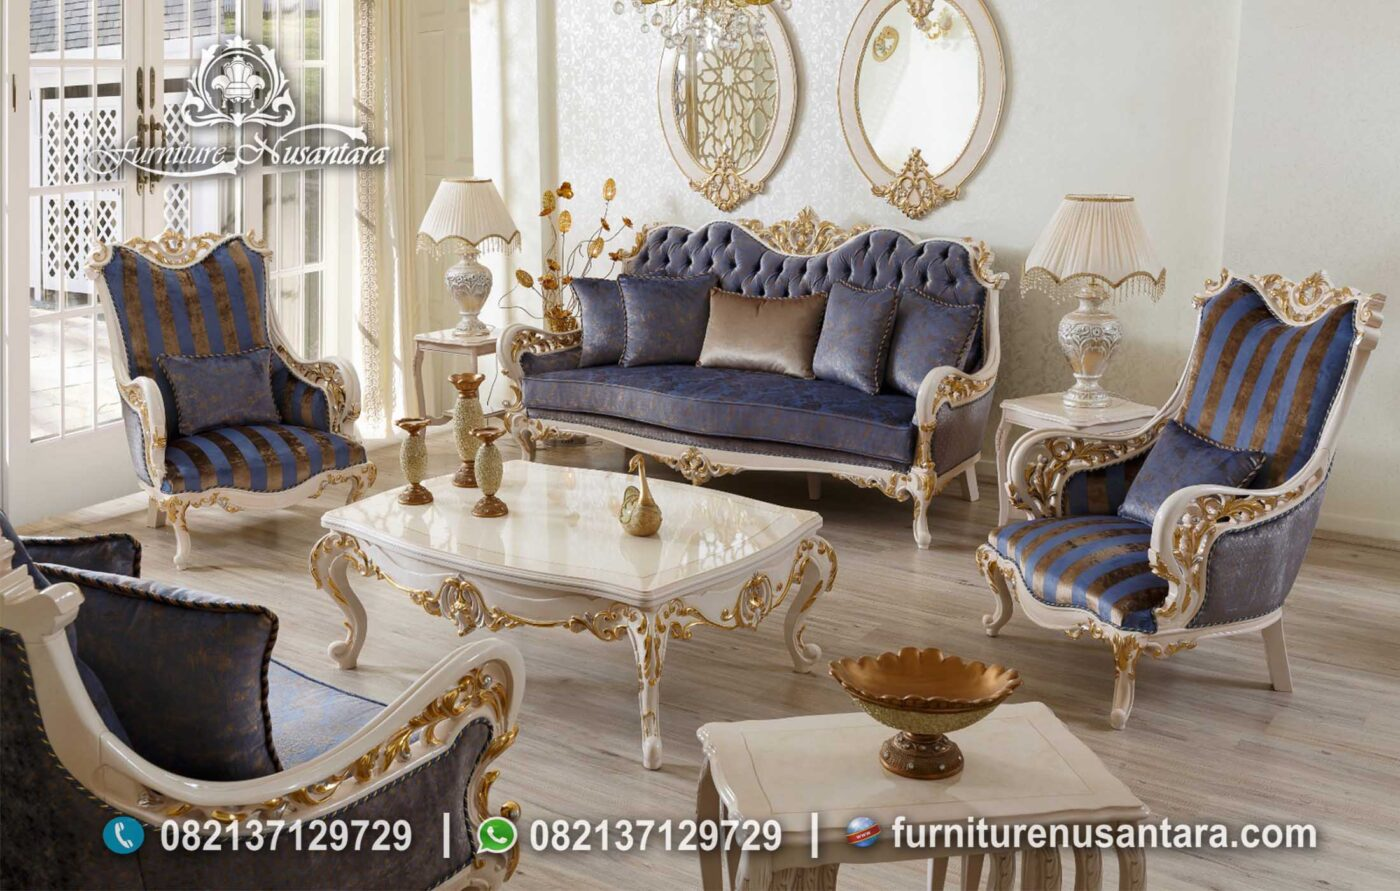 Sofa Retro Klasik Ukir Mewah Modern ST-49, Furniture Nusantara